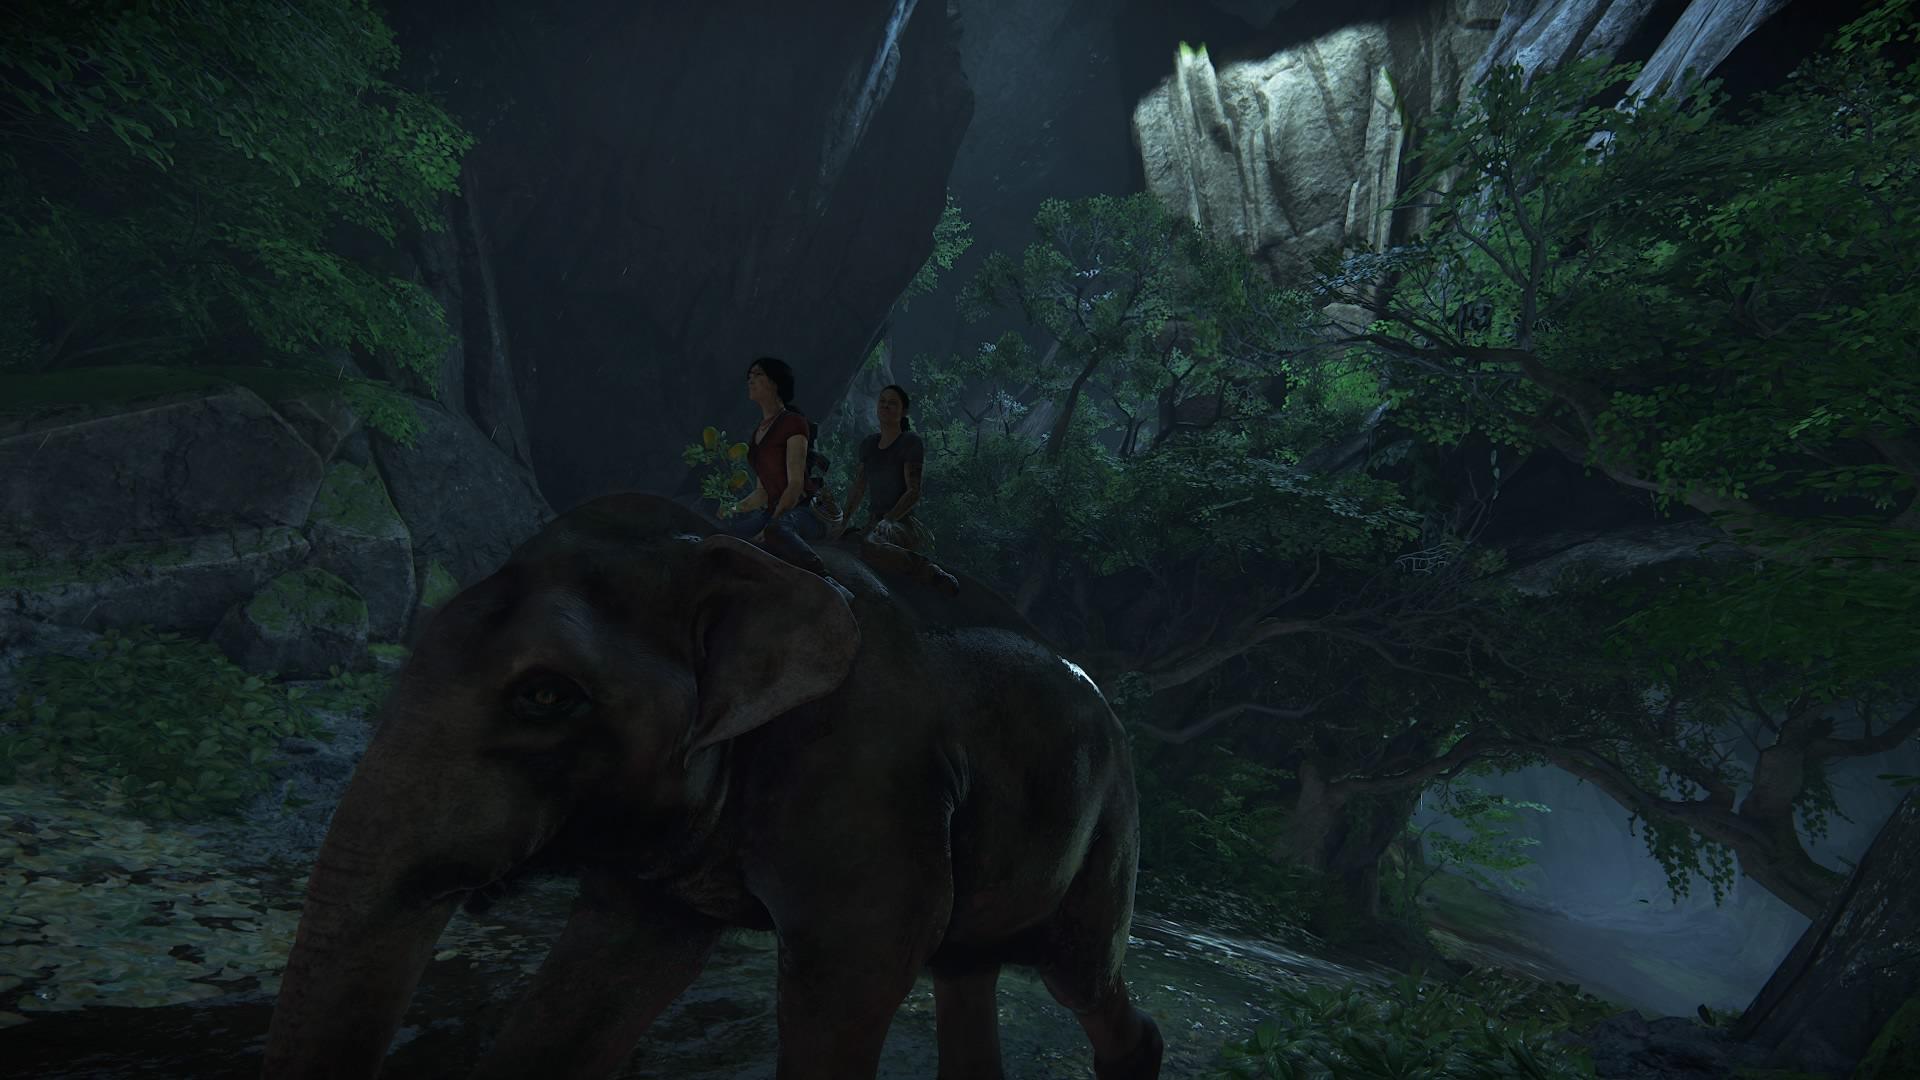 Chloe and Nadine riding an elephant.